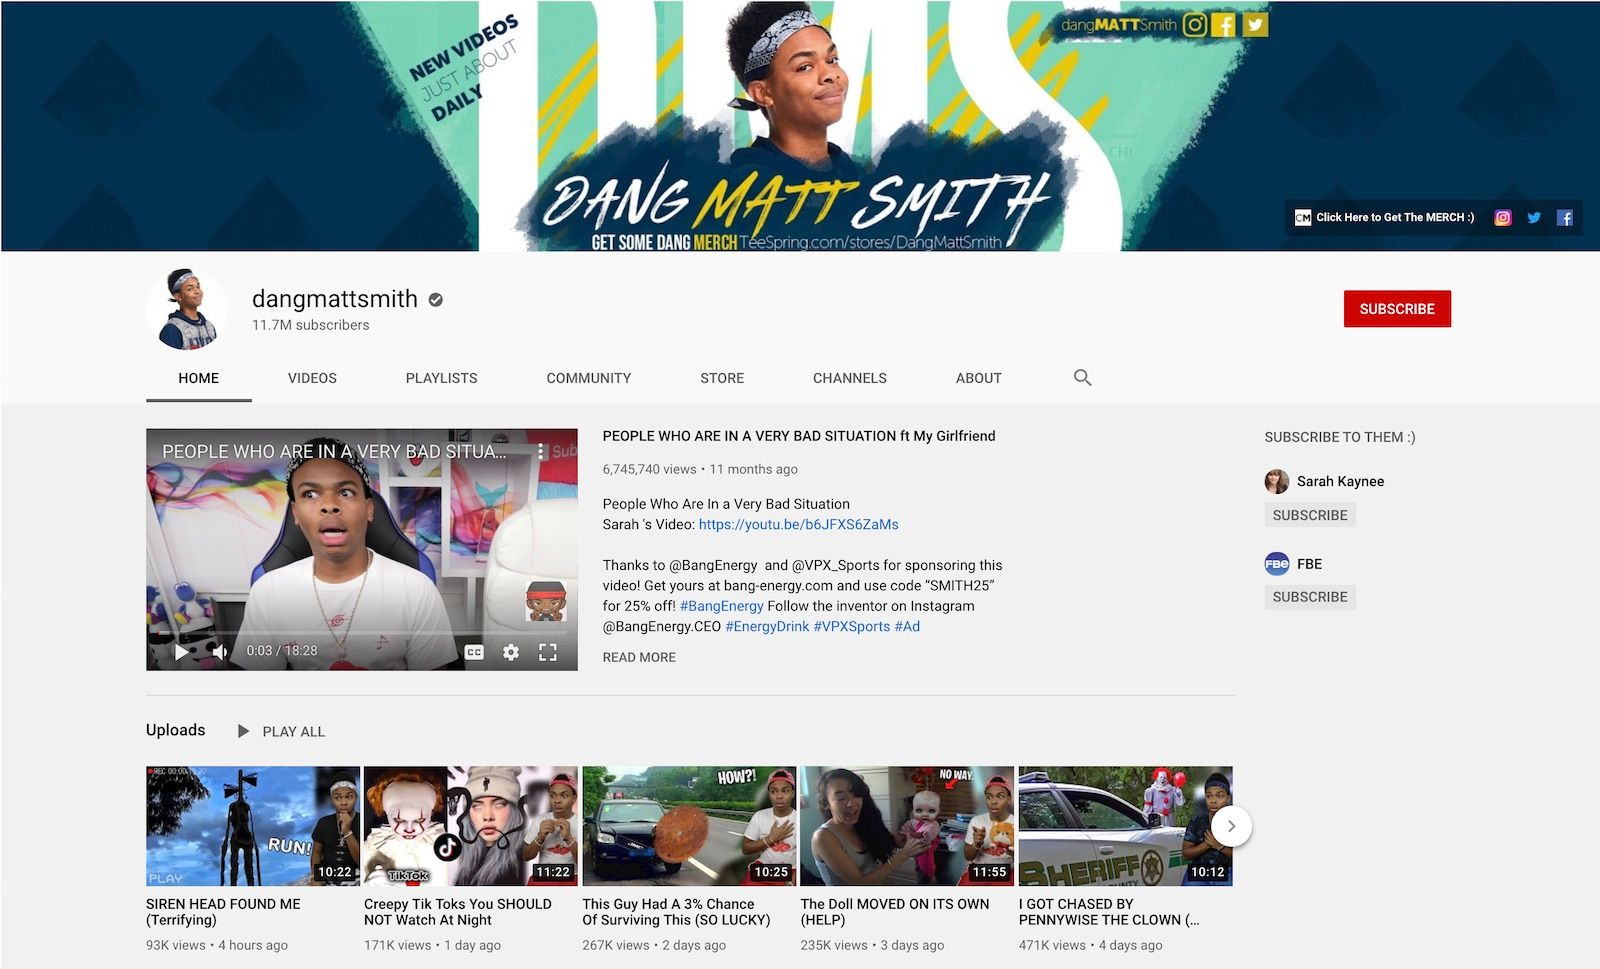 dangmattsmith YouTube channel